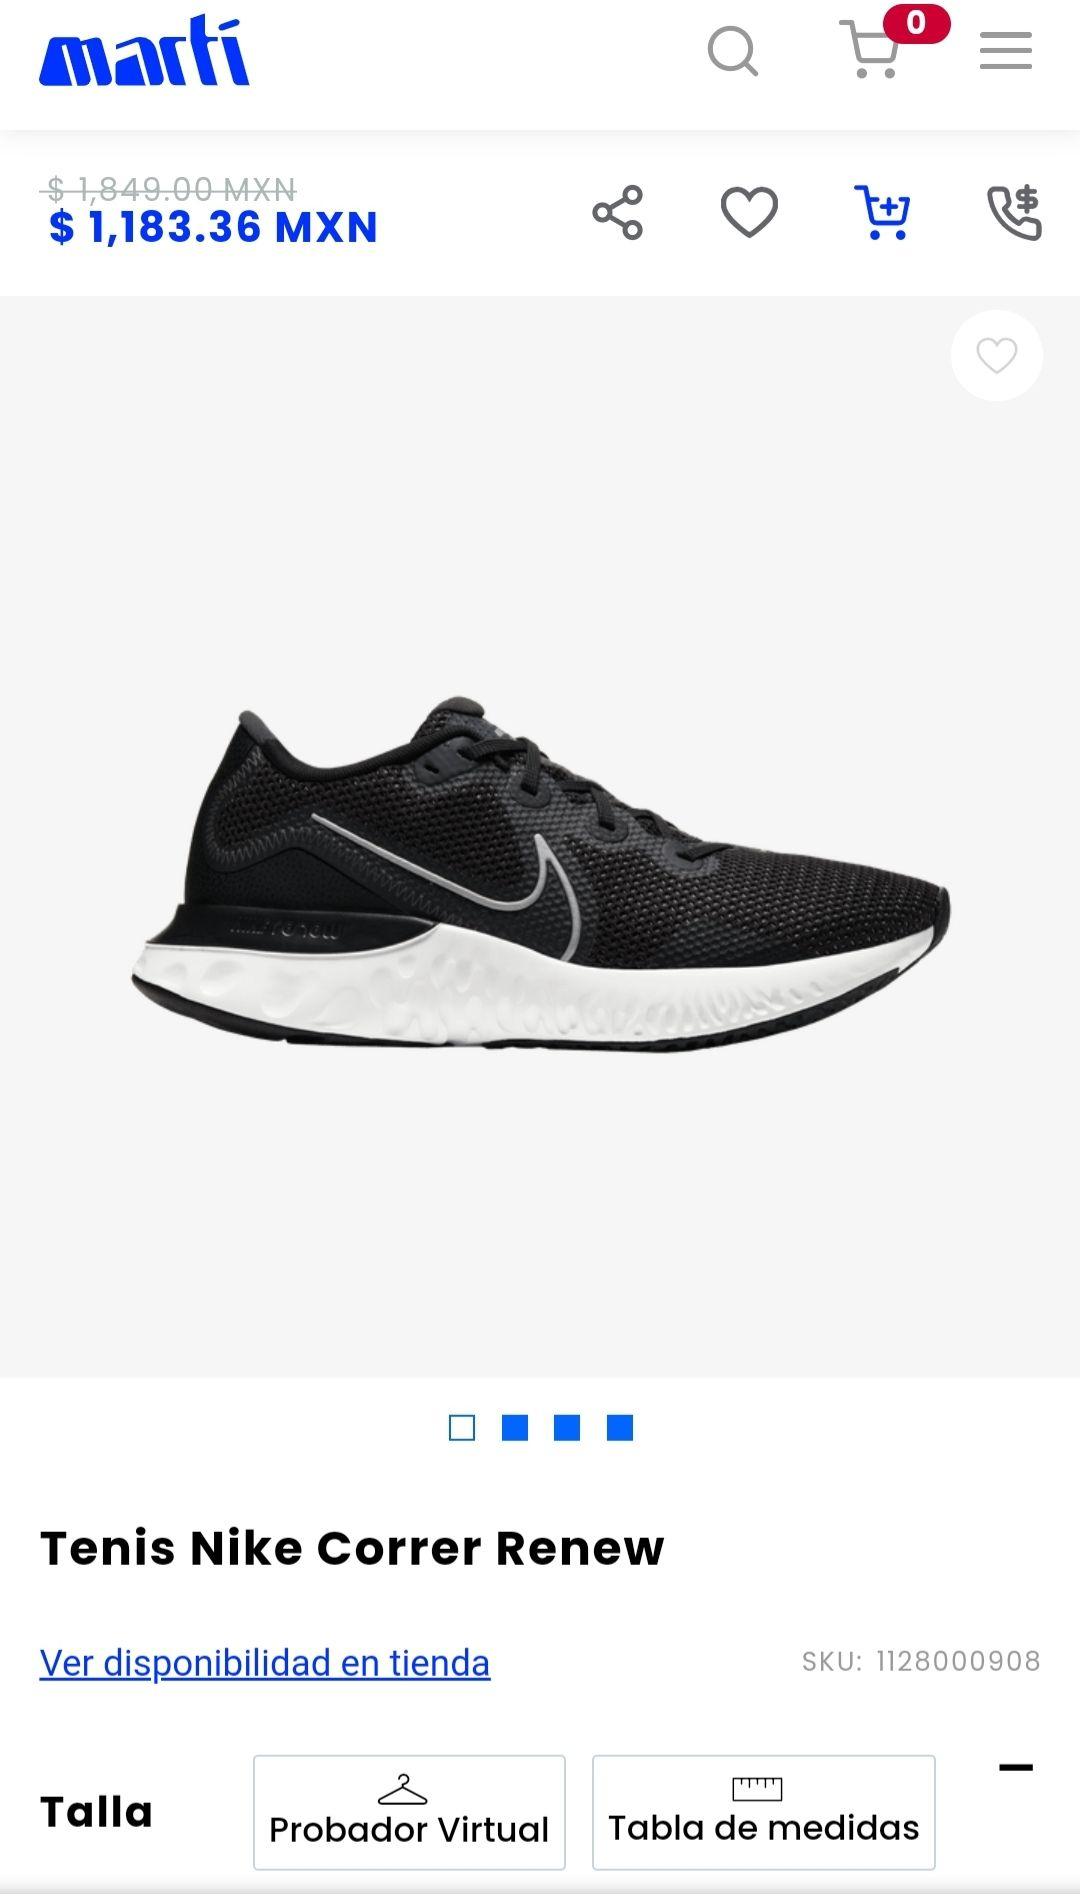 Martí: Tenis Nike Renew